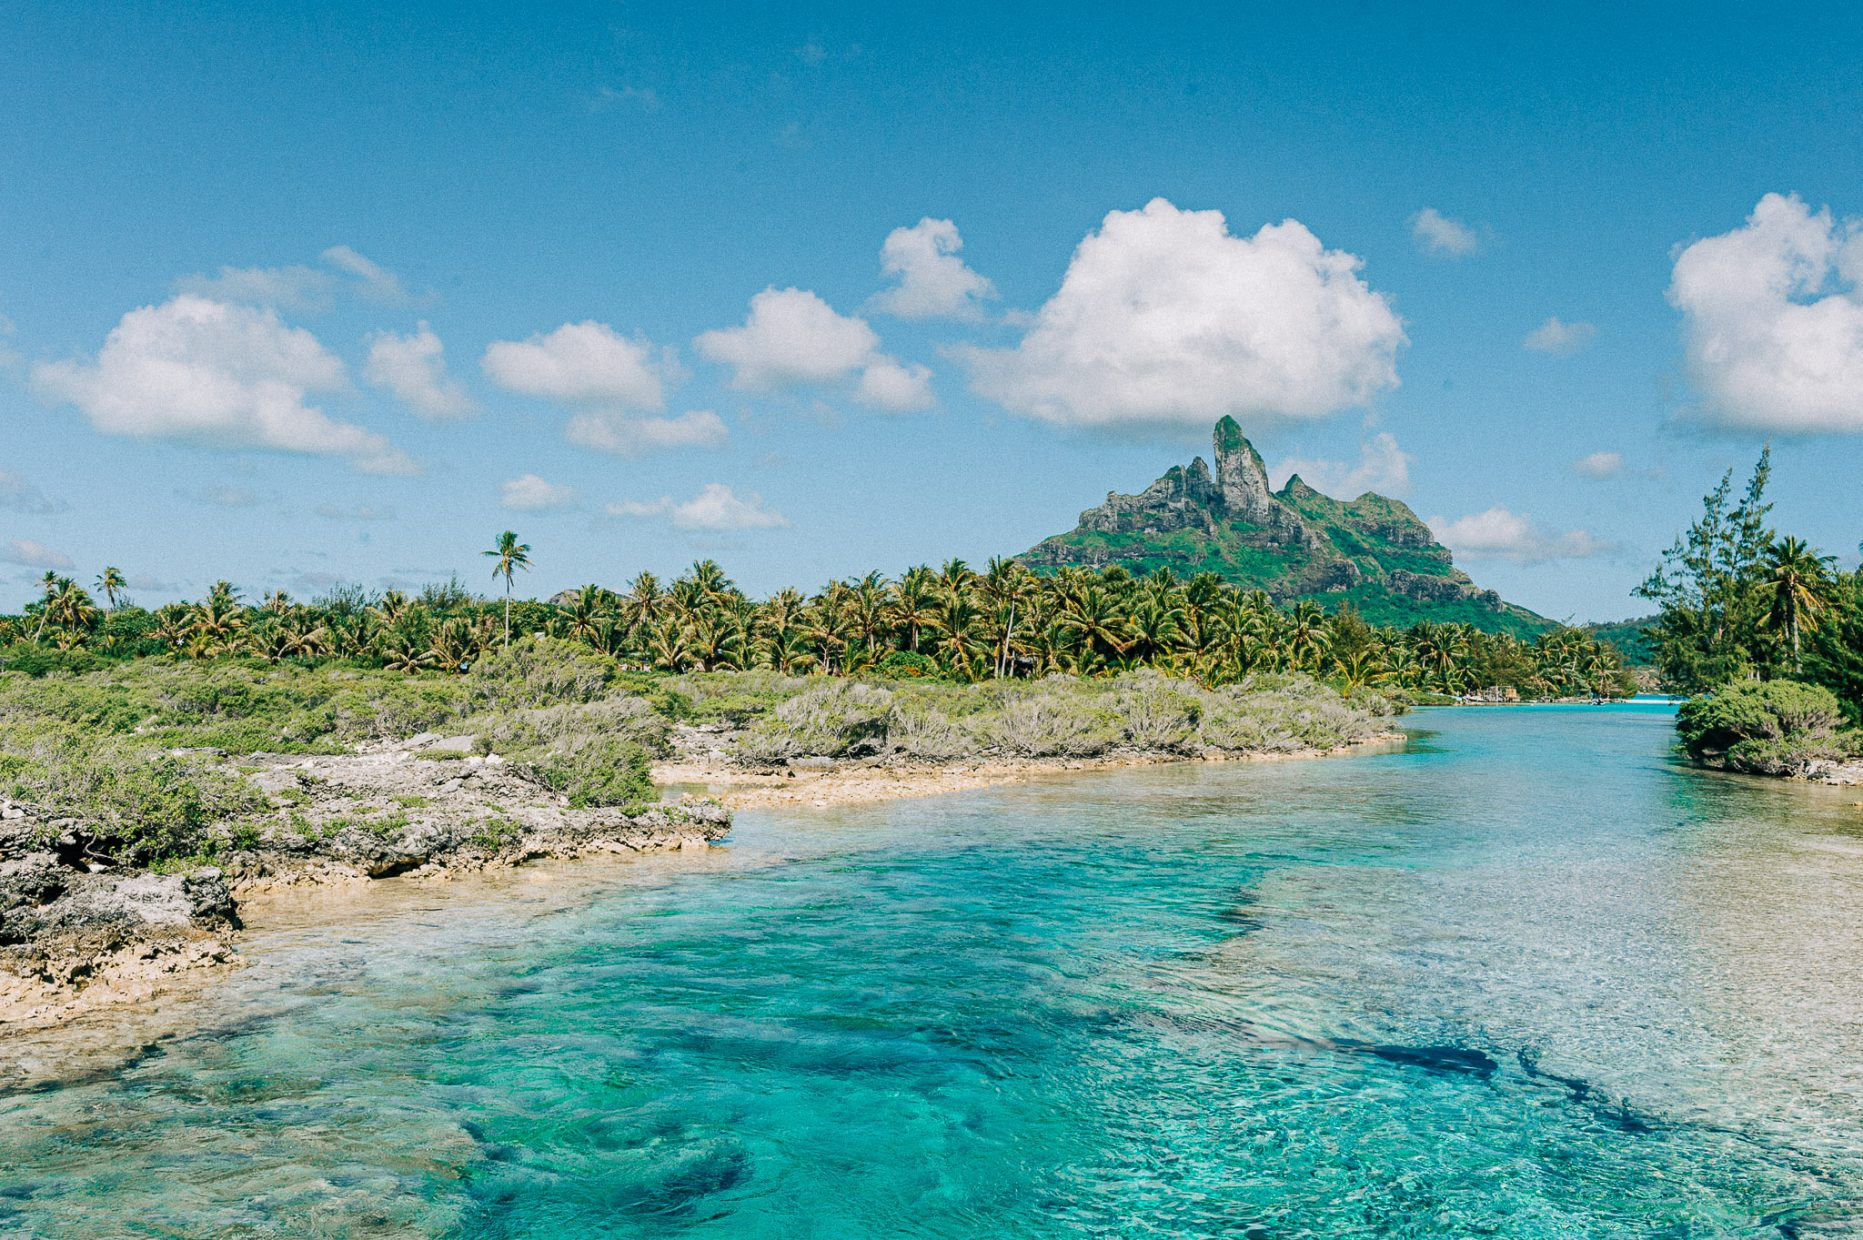 St. Regis - Bora Bora | Landscape